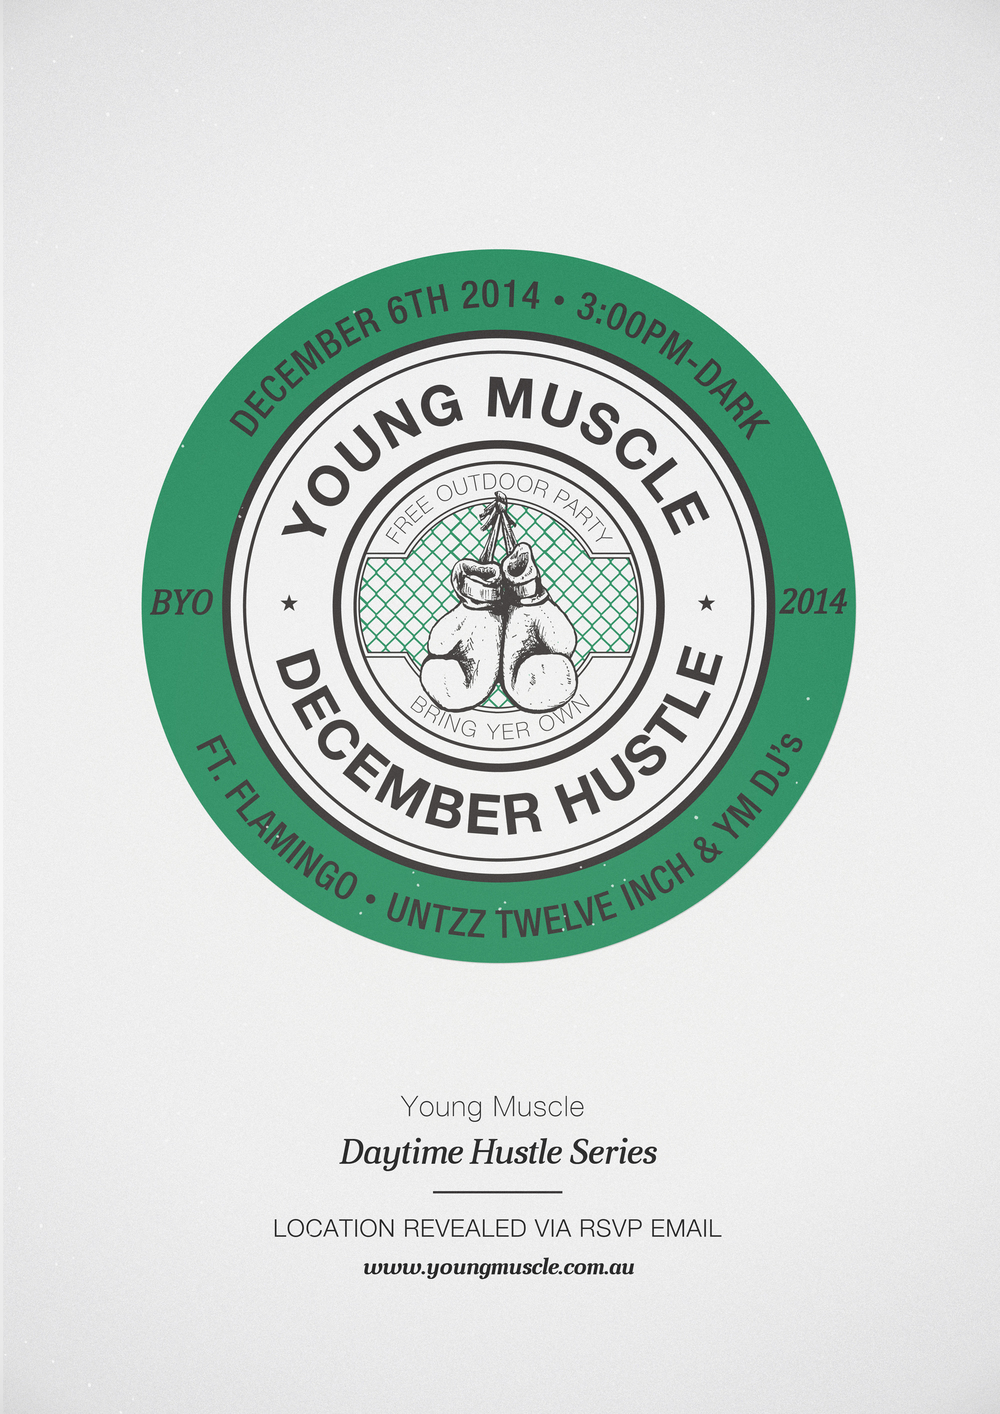 YOUNG MUSCLE DAYTIME HUSTLE WEB.jpg